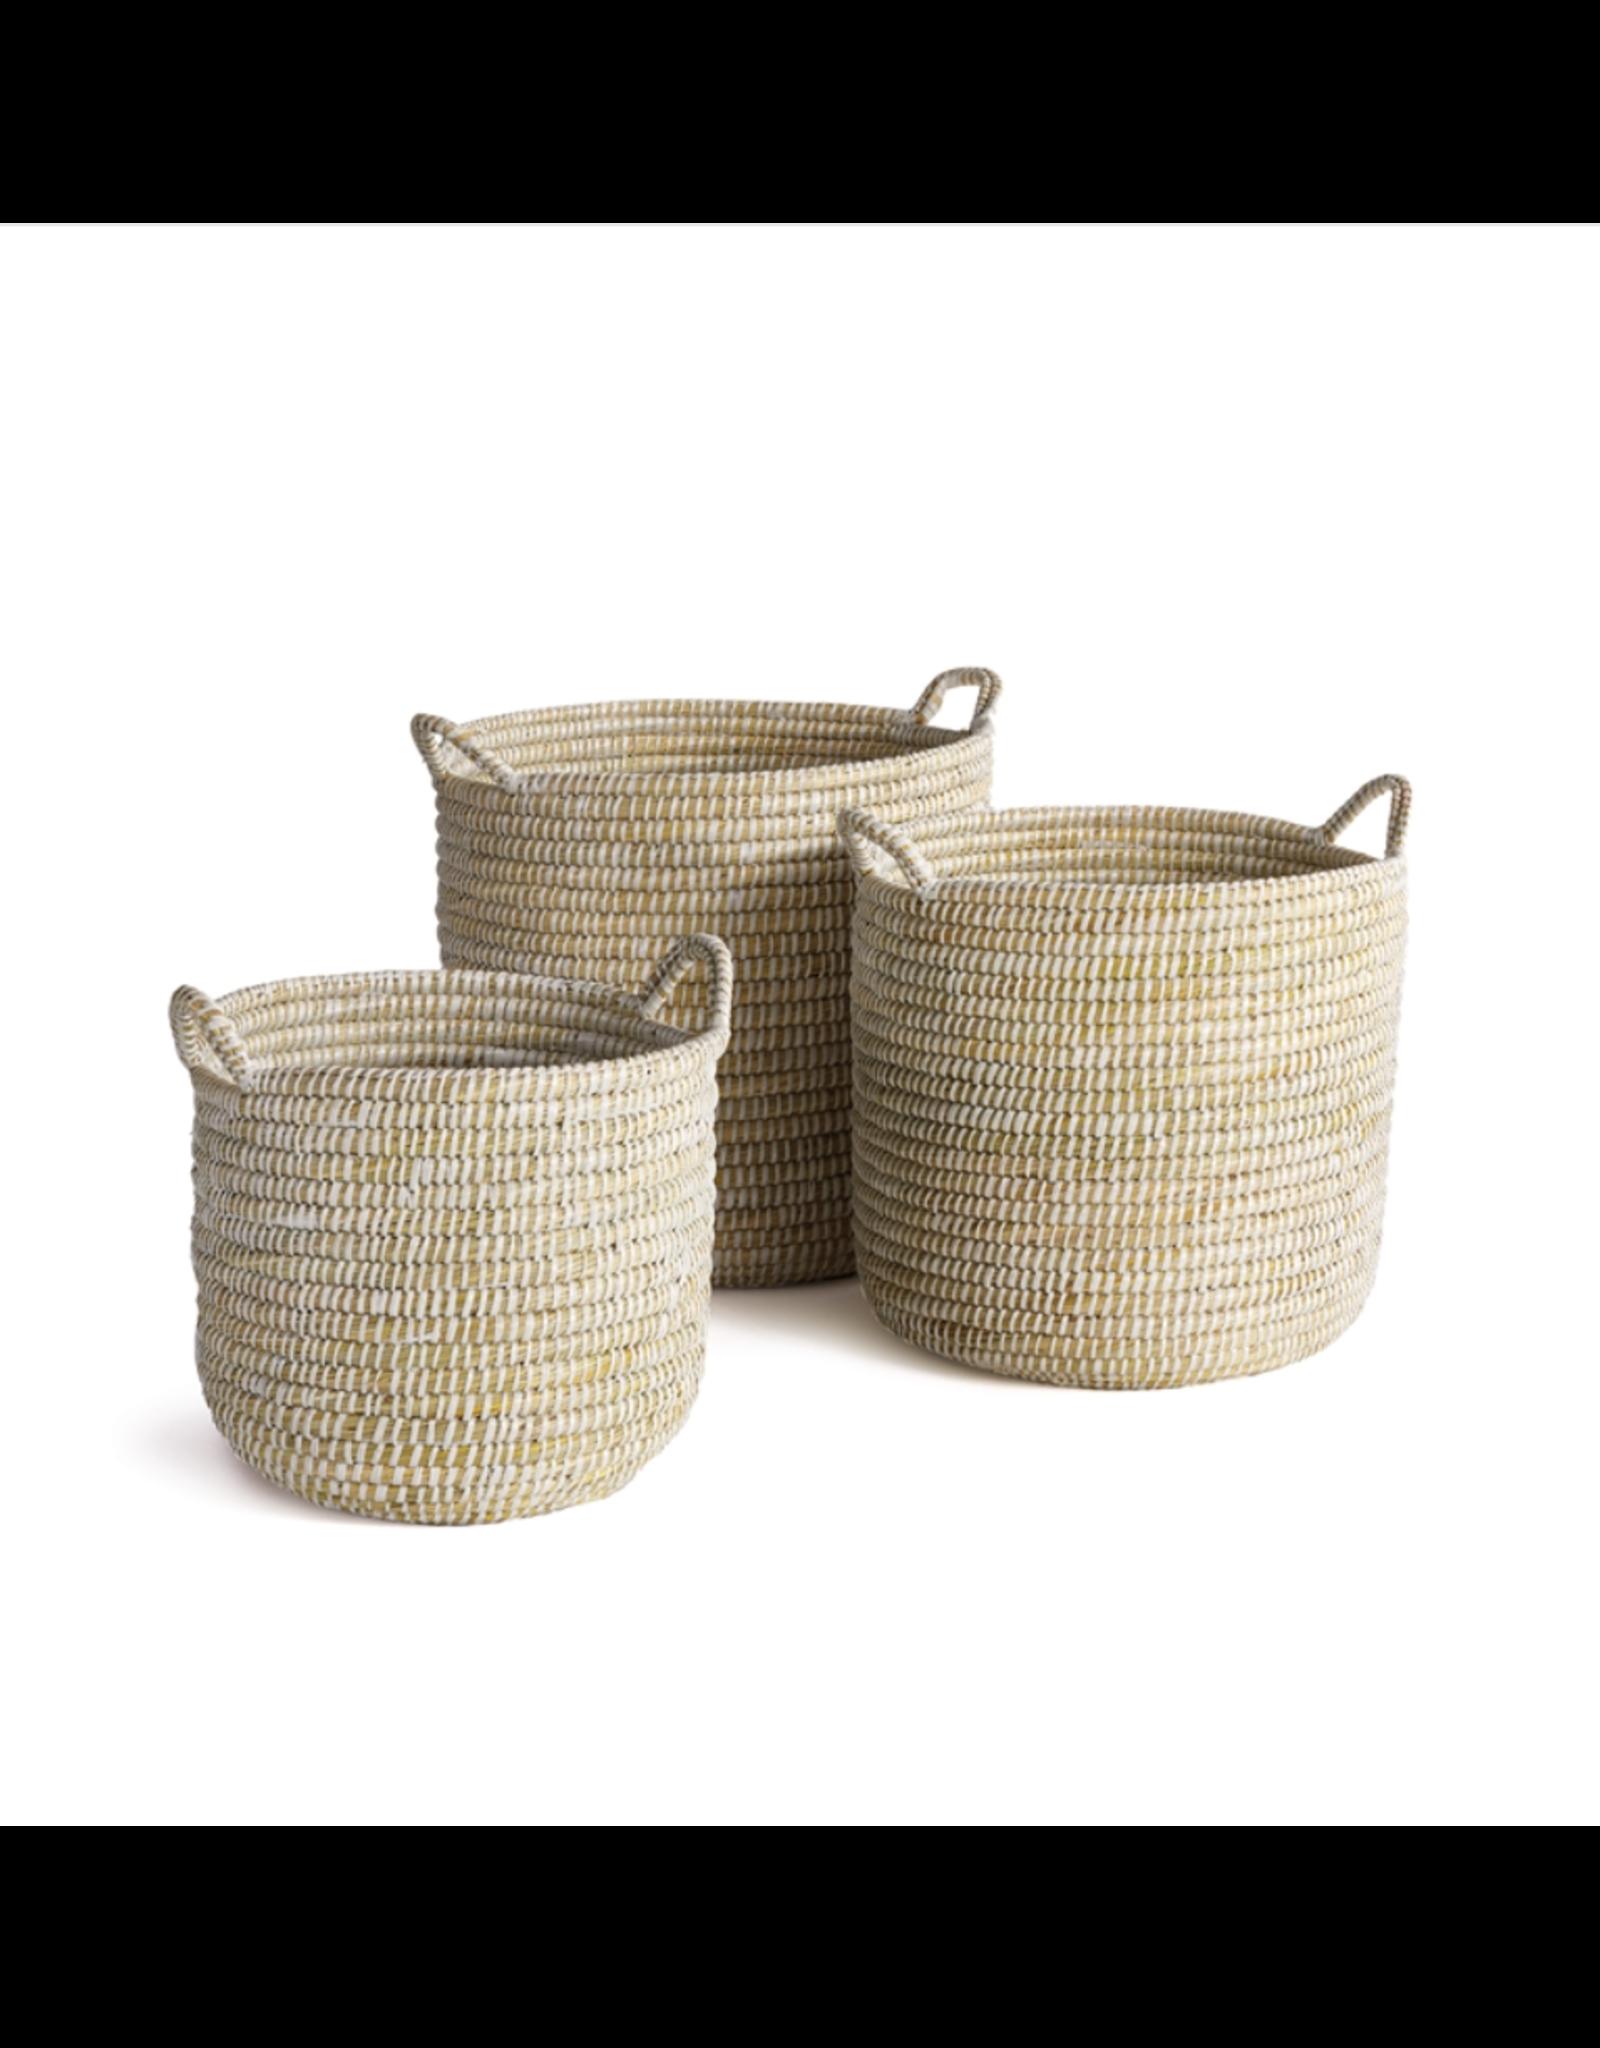 Oak + Arrow Interiors Rivergrass Basket with Handles - Small